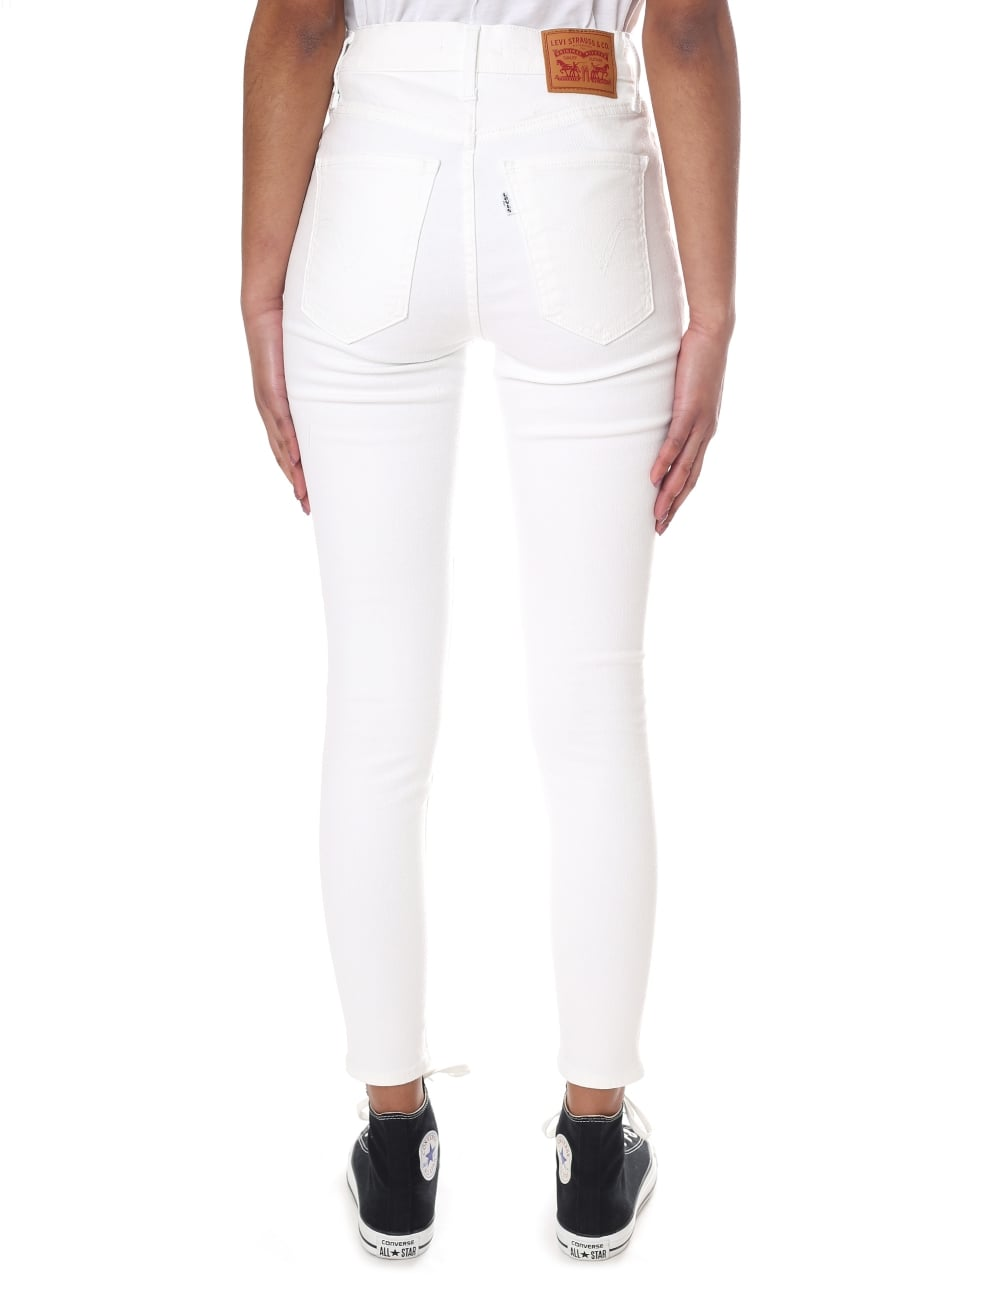 ff1ec638718c41 Levi's Mile High Women's Super Skinny Ankle Jean